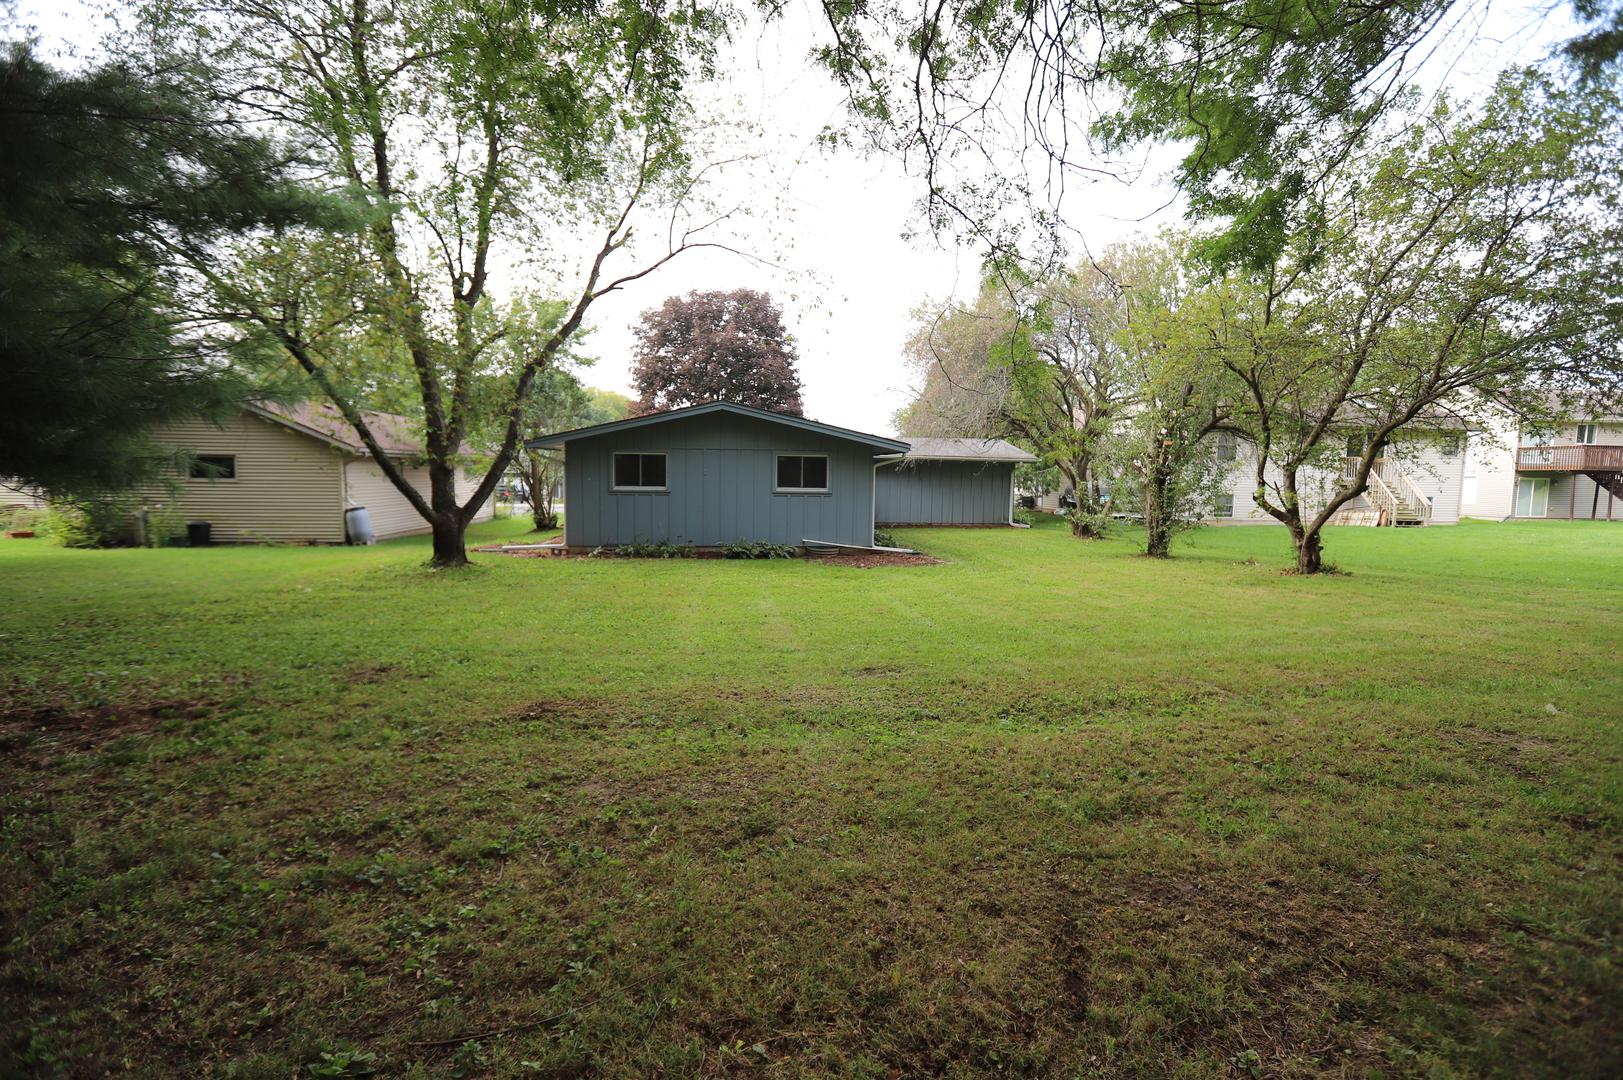 909 Candlewick, Poplar Grove, Illinois, 61065